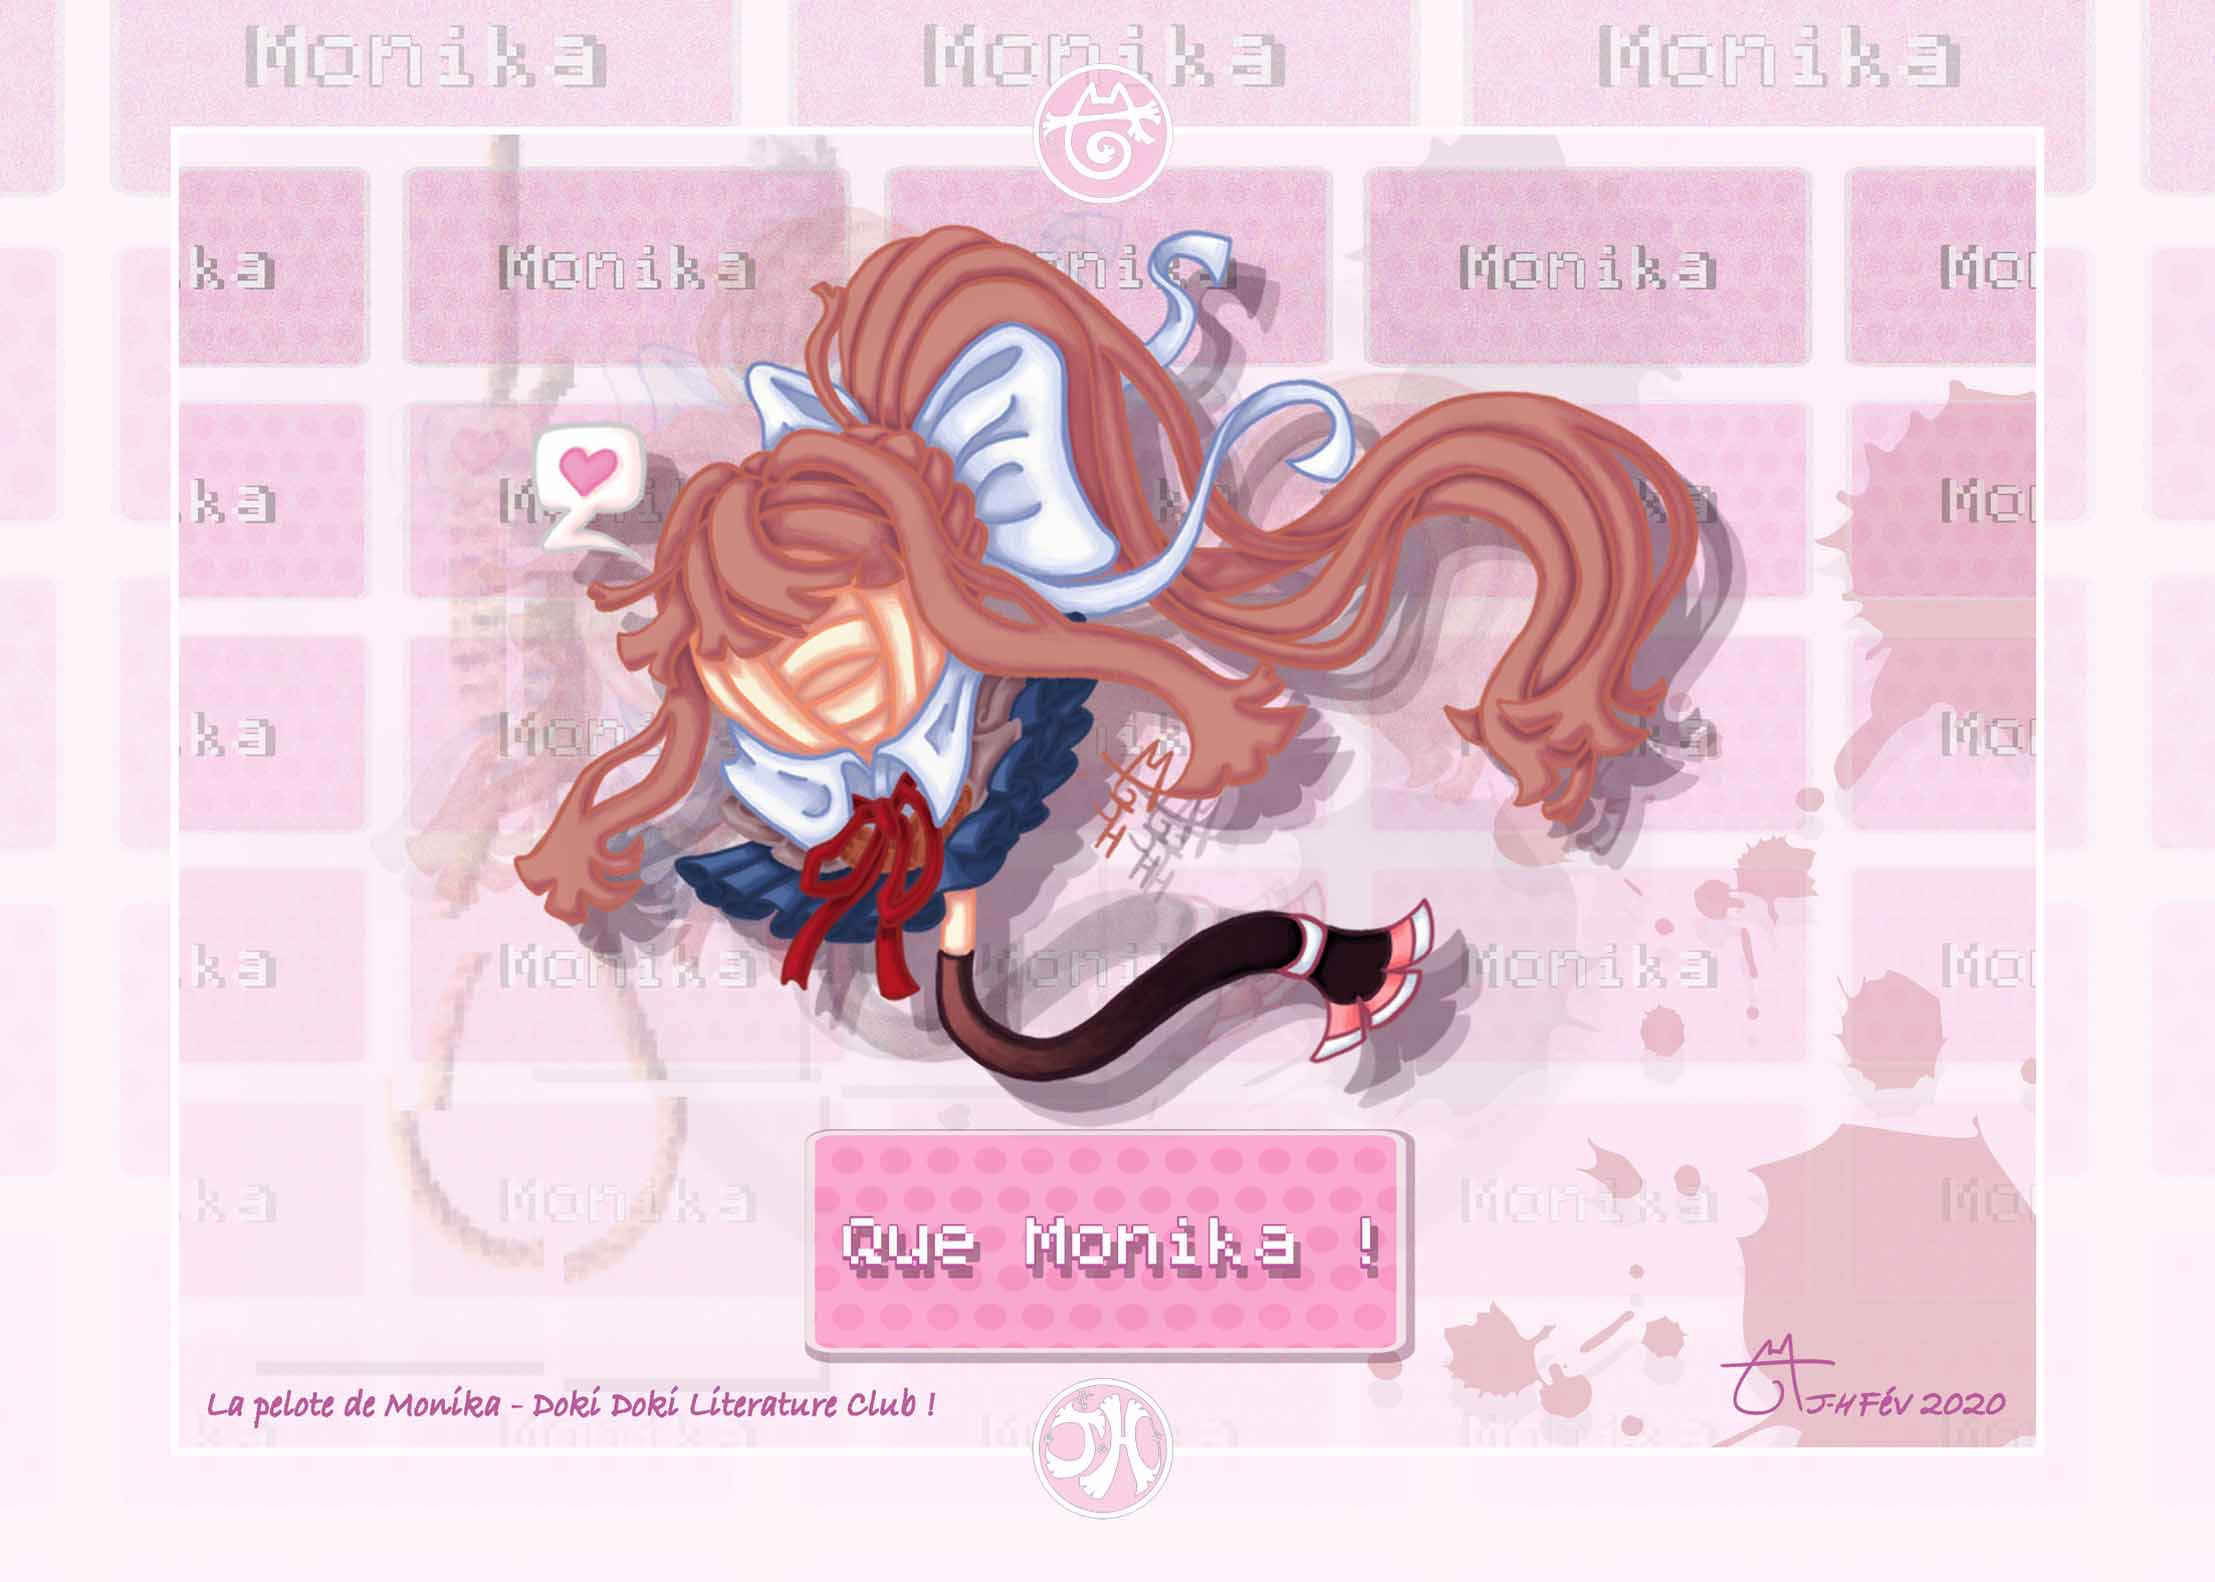 La pelote de laine de Monika - Doki Doki Literature Club !